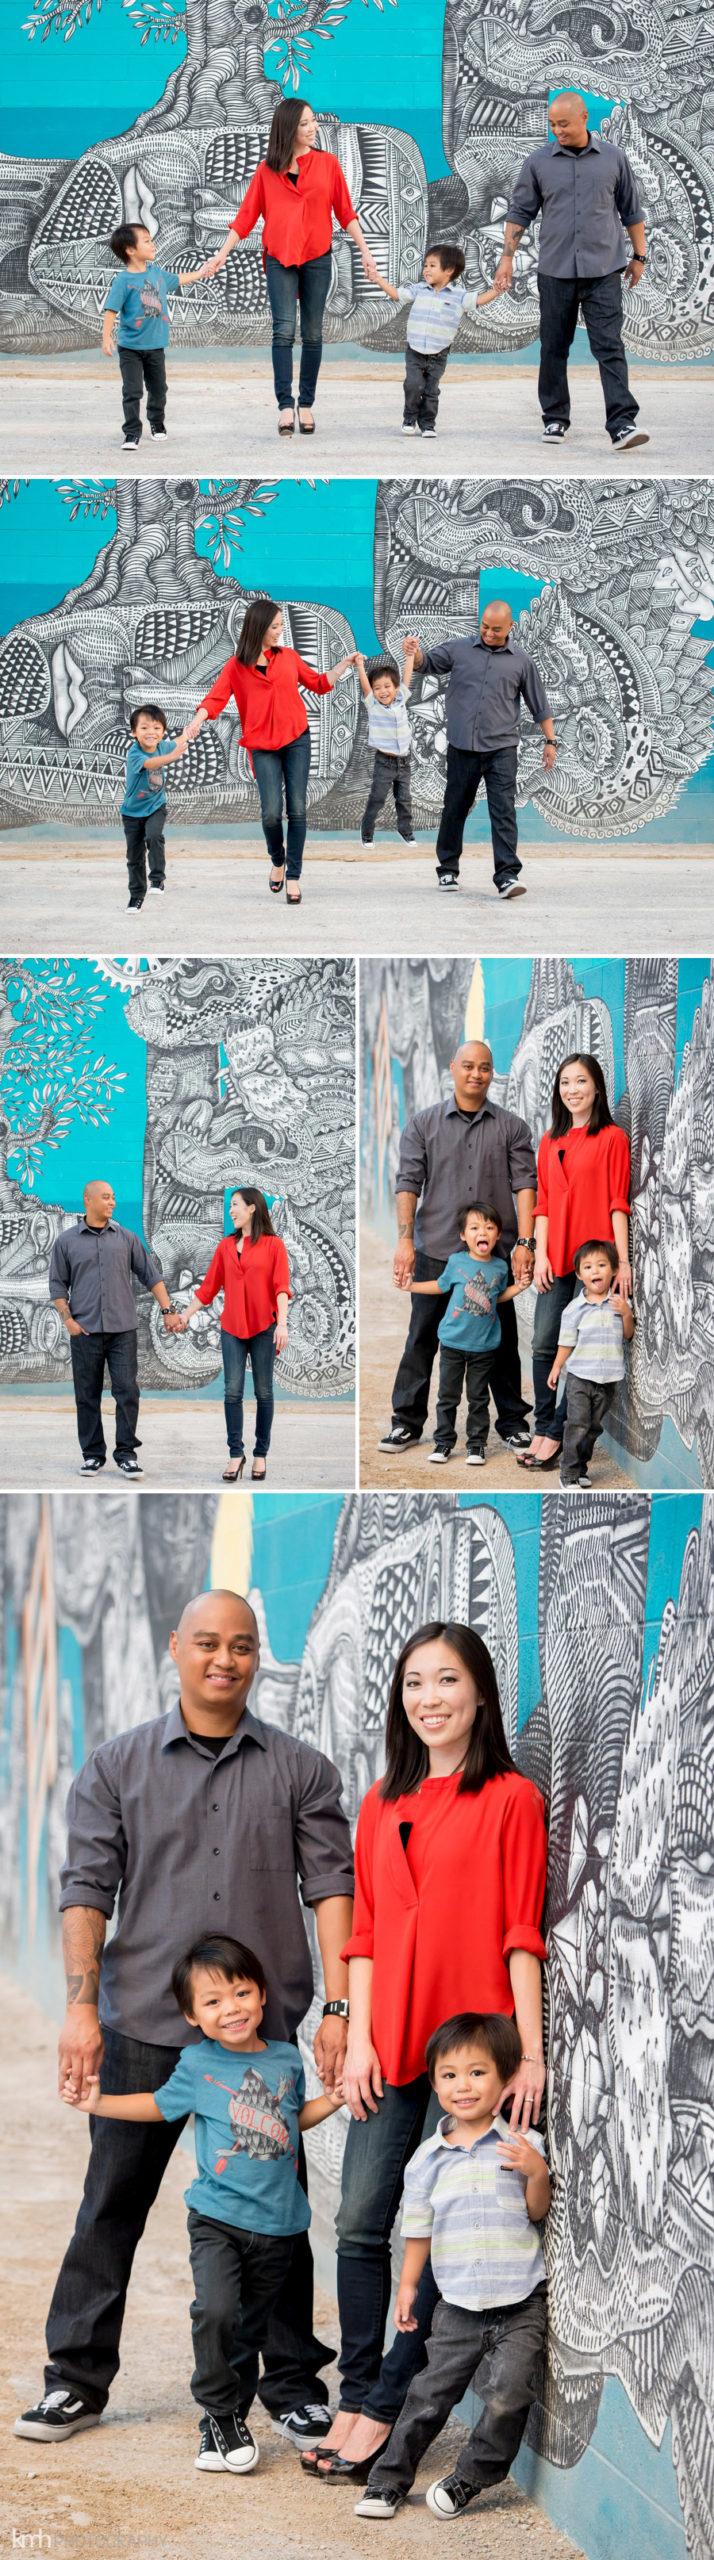 kmh-downtown-las-vegas-family-photography-1115-3